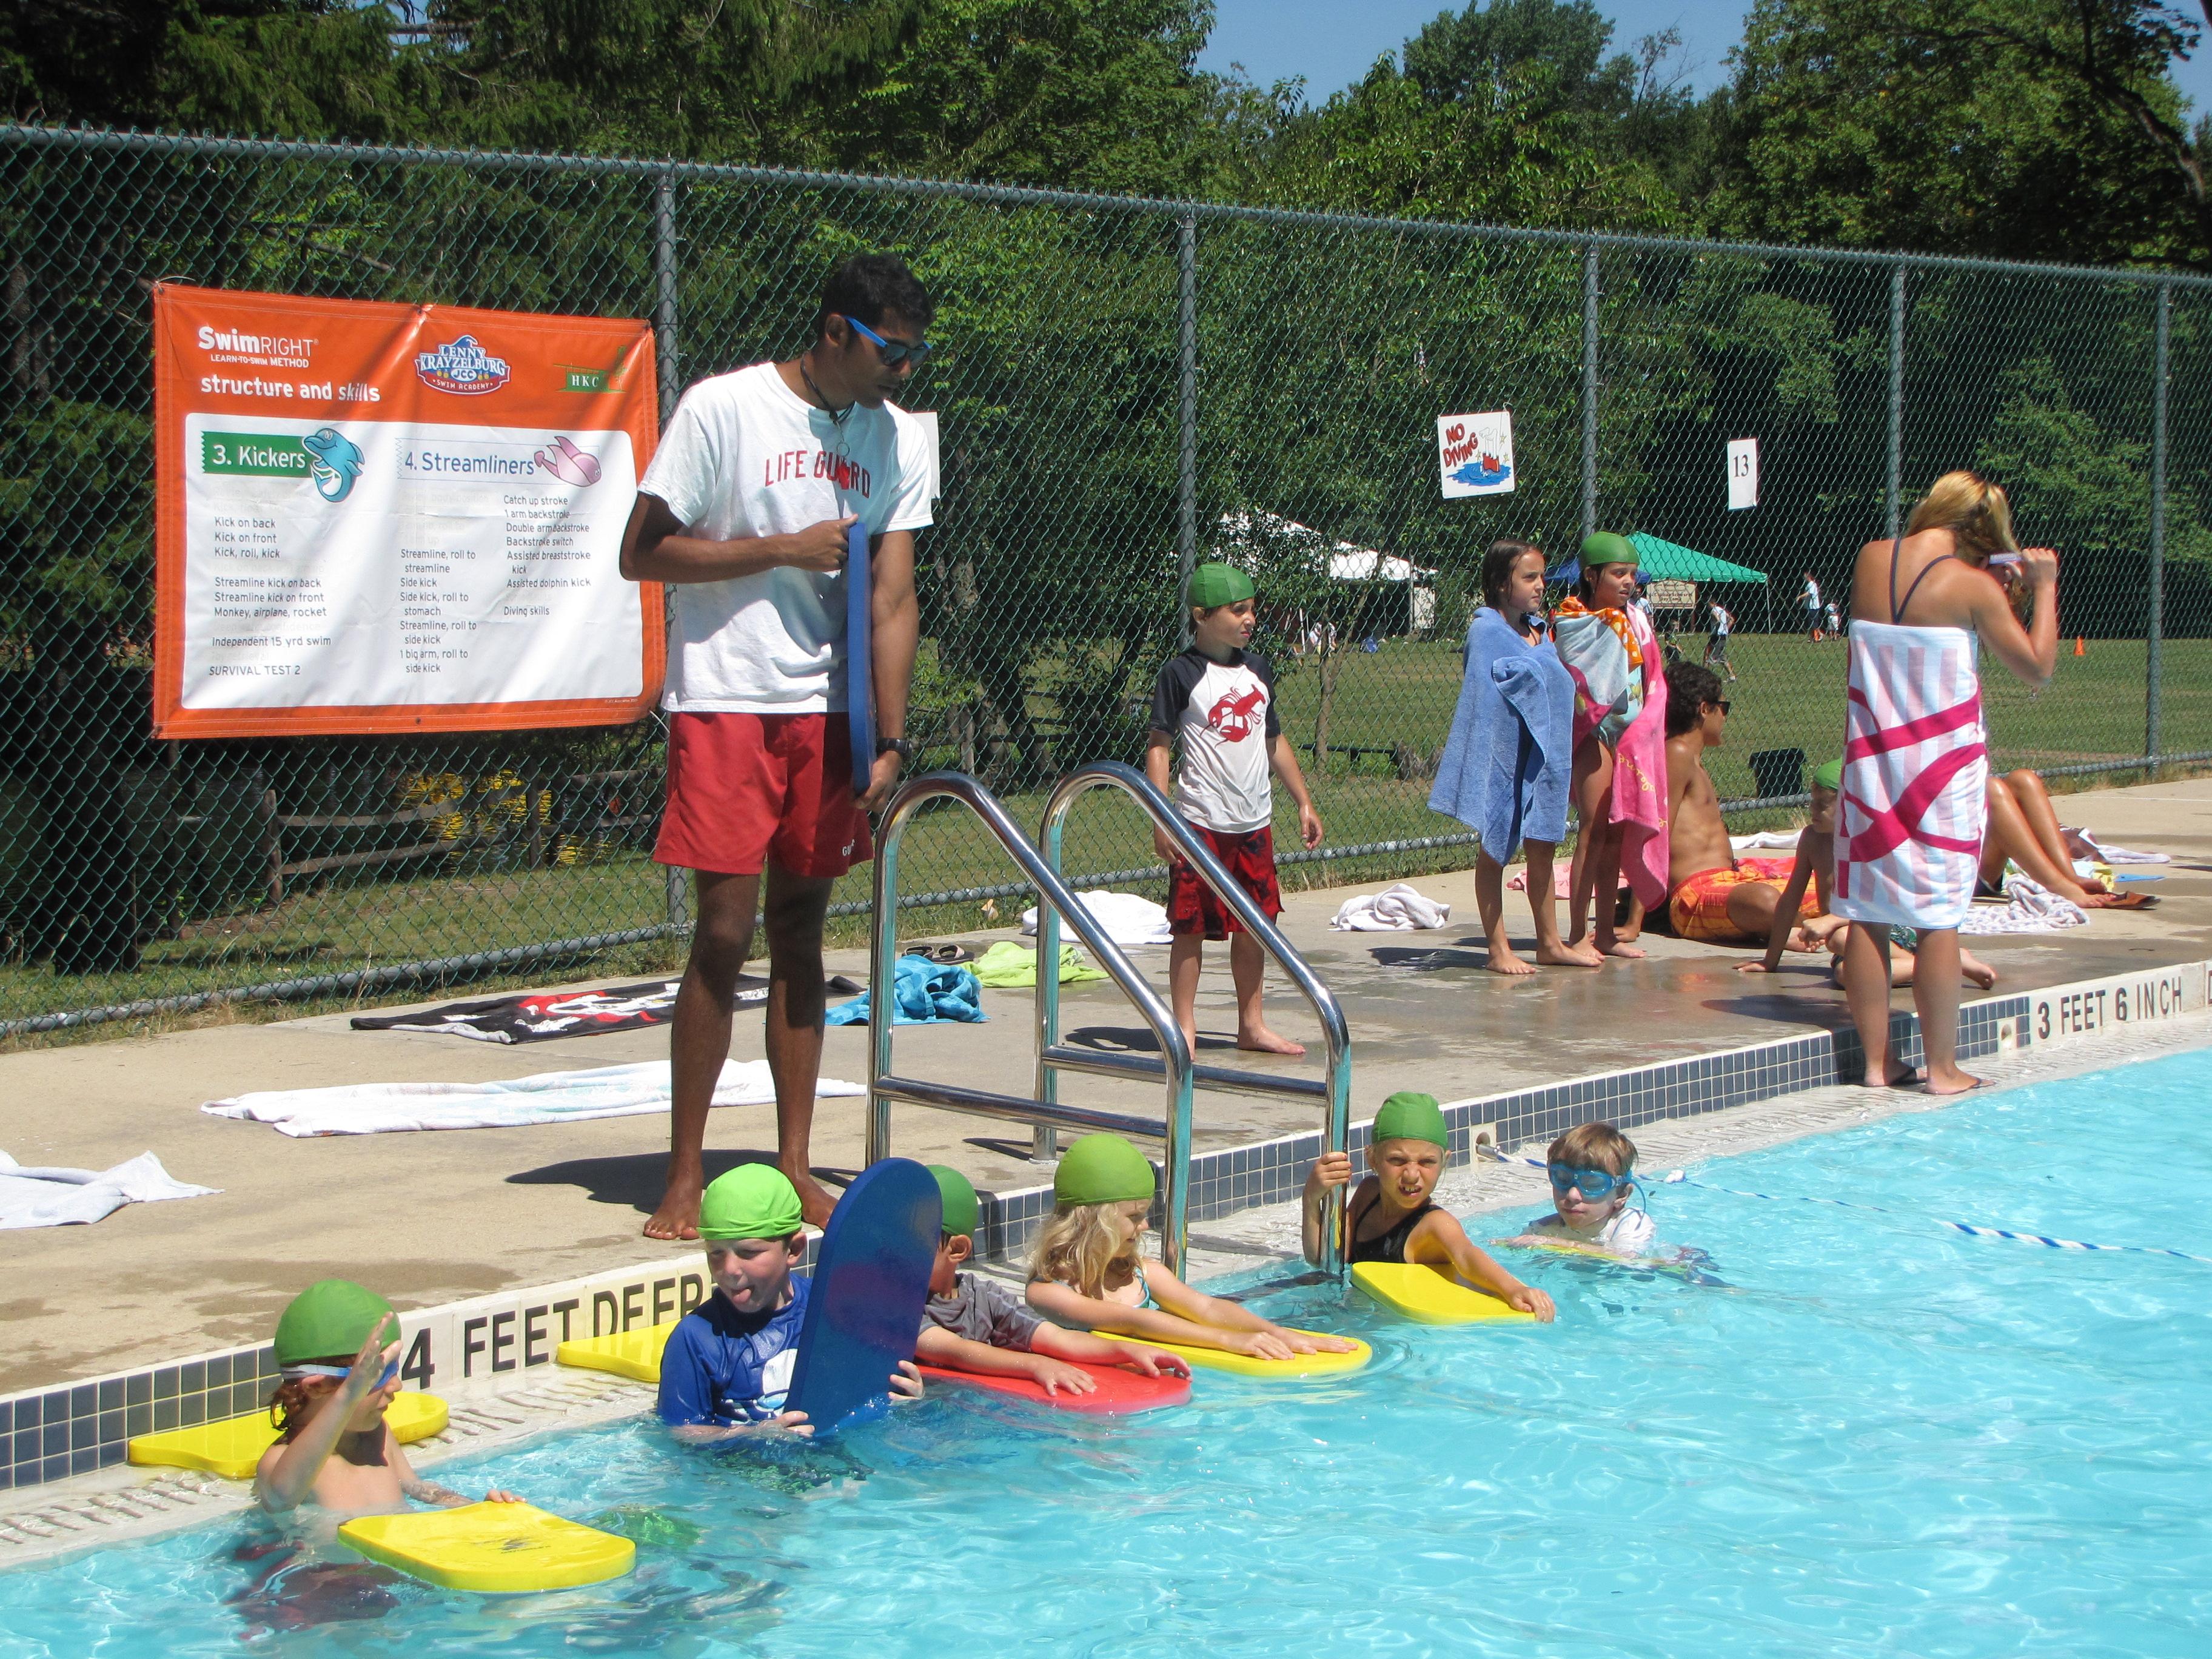 Learning to swim using the LKSA SwimRight technique.